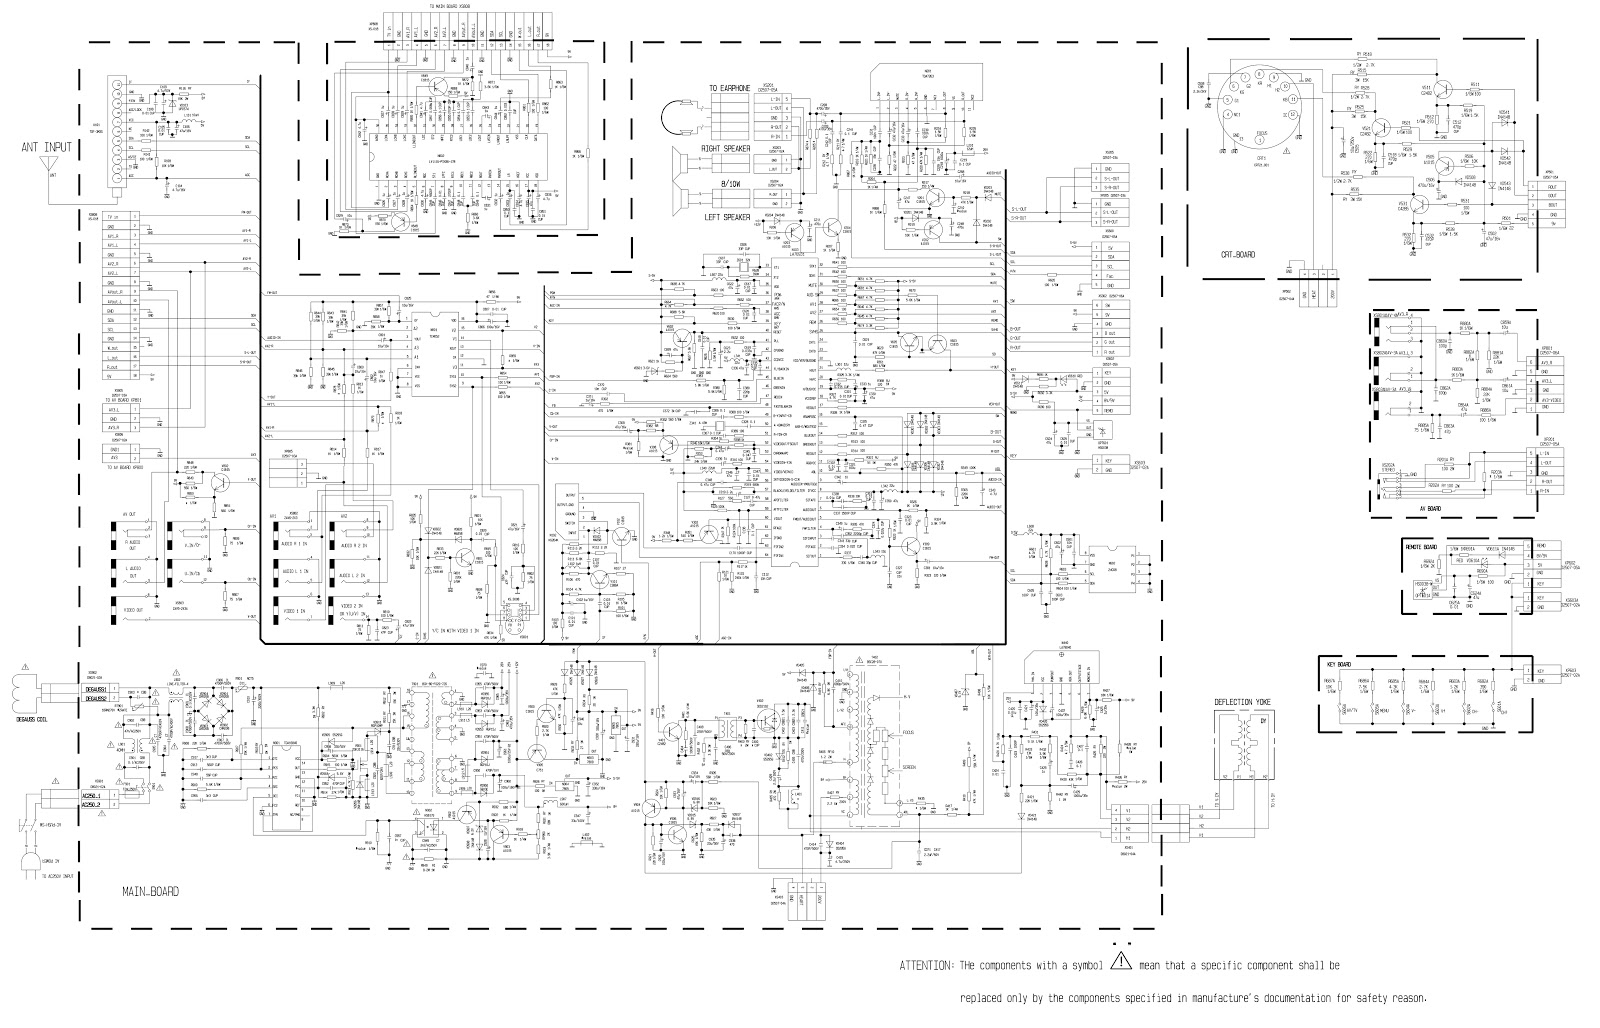 small resolution of top house kp21sa210 crt tv circuit diagram